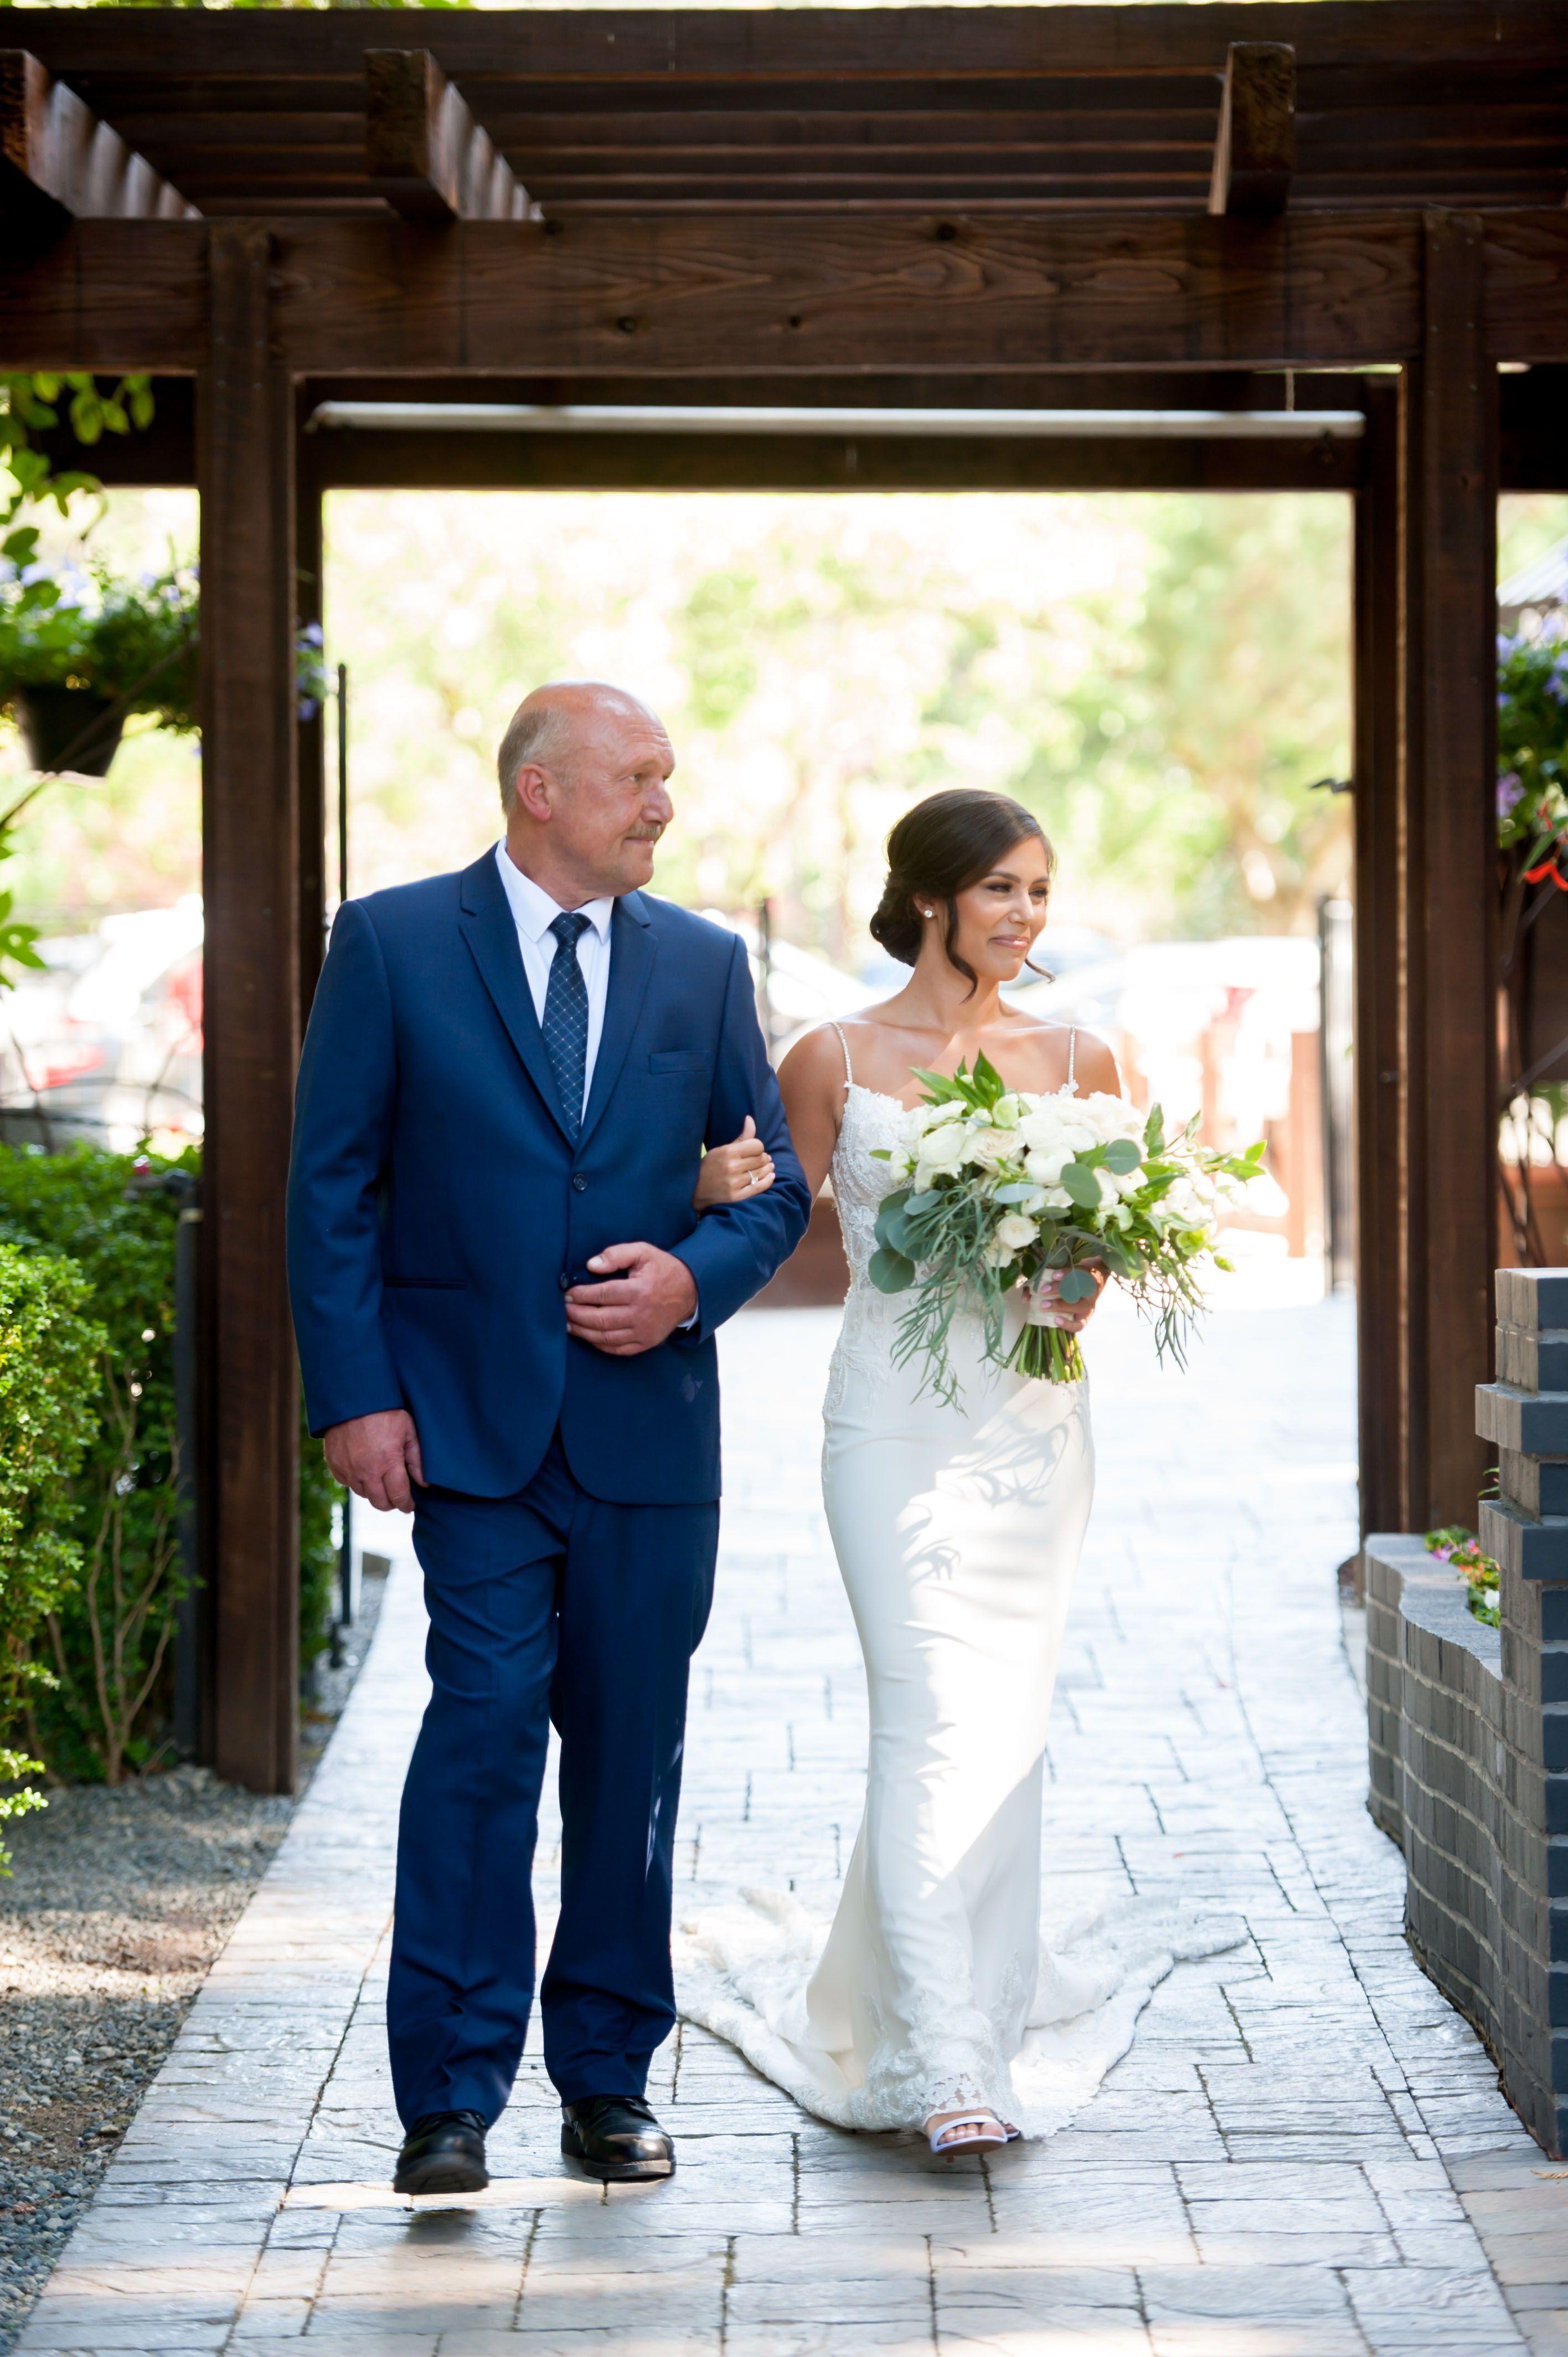 Bride walking down aisle at deer park villa in 2020